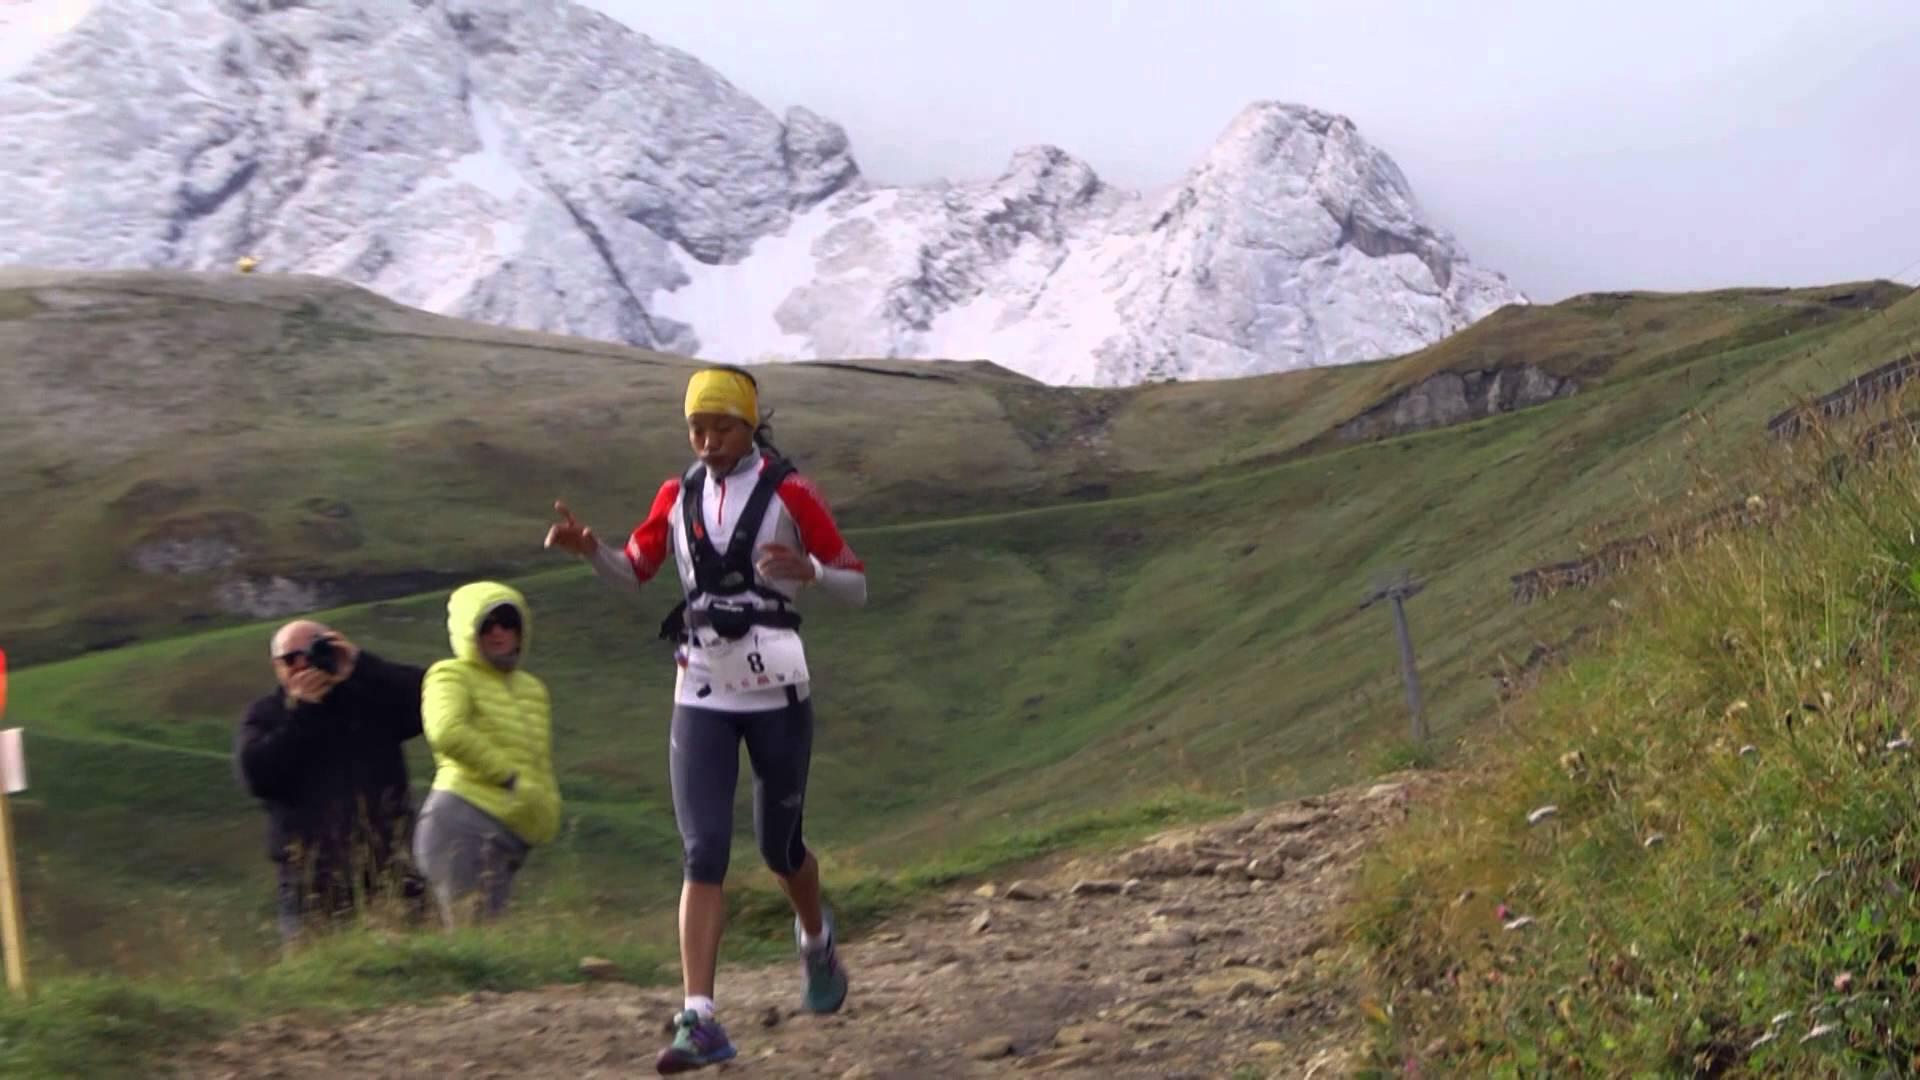 Trail Running Wallpaper Sellaronda Trail Running 2014 1920x1080